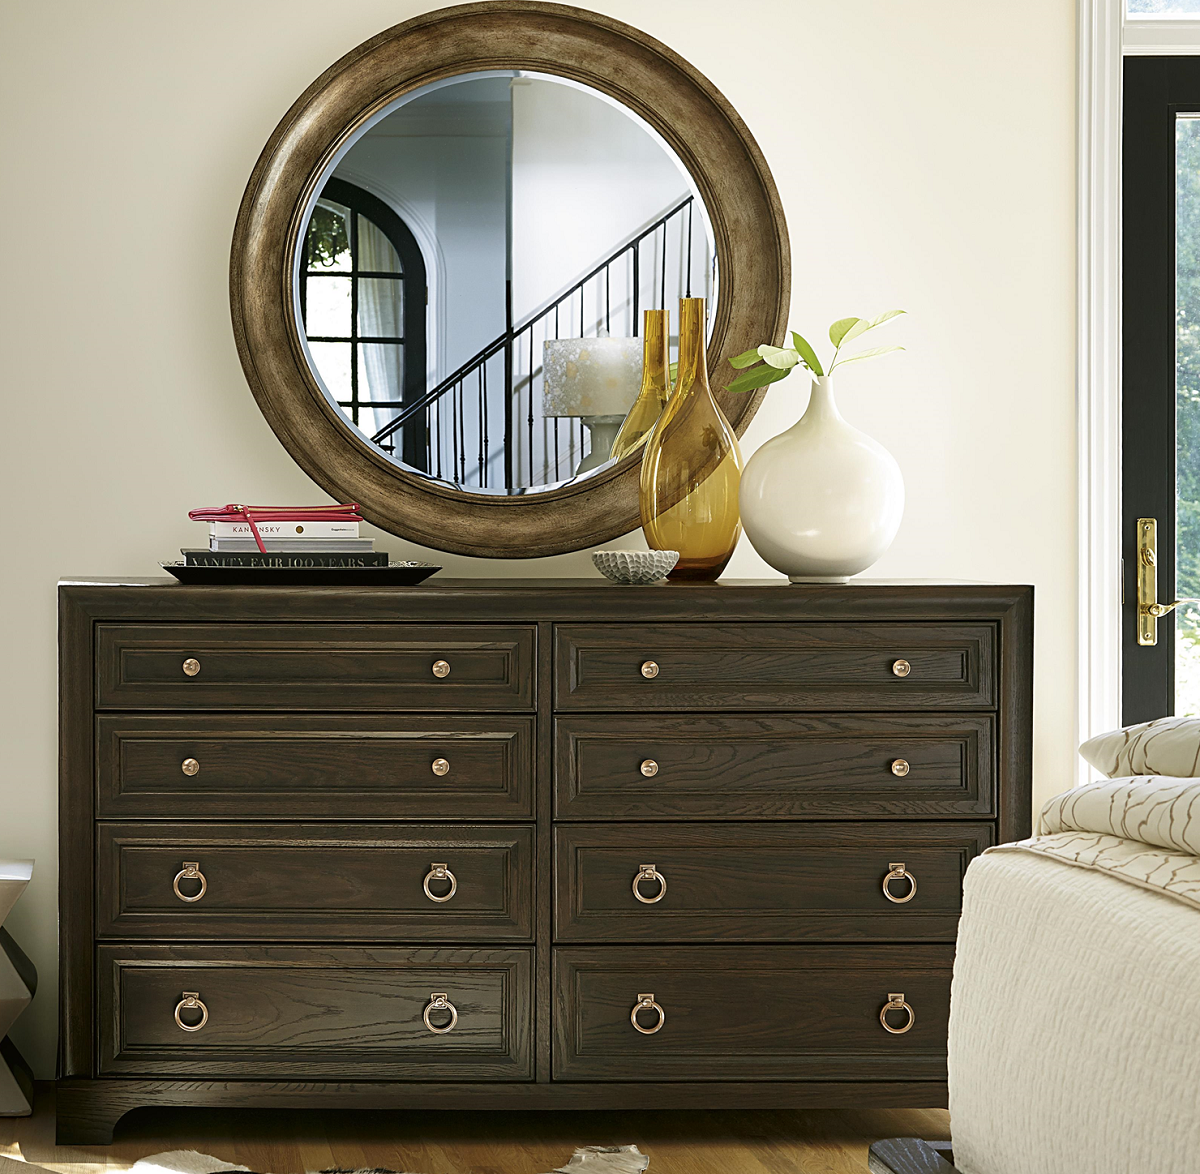 California Rustic Oak 8 Drawer Dresser Furniture 8 Drawer